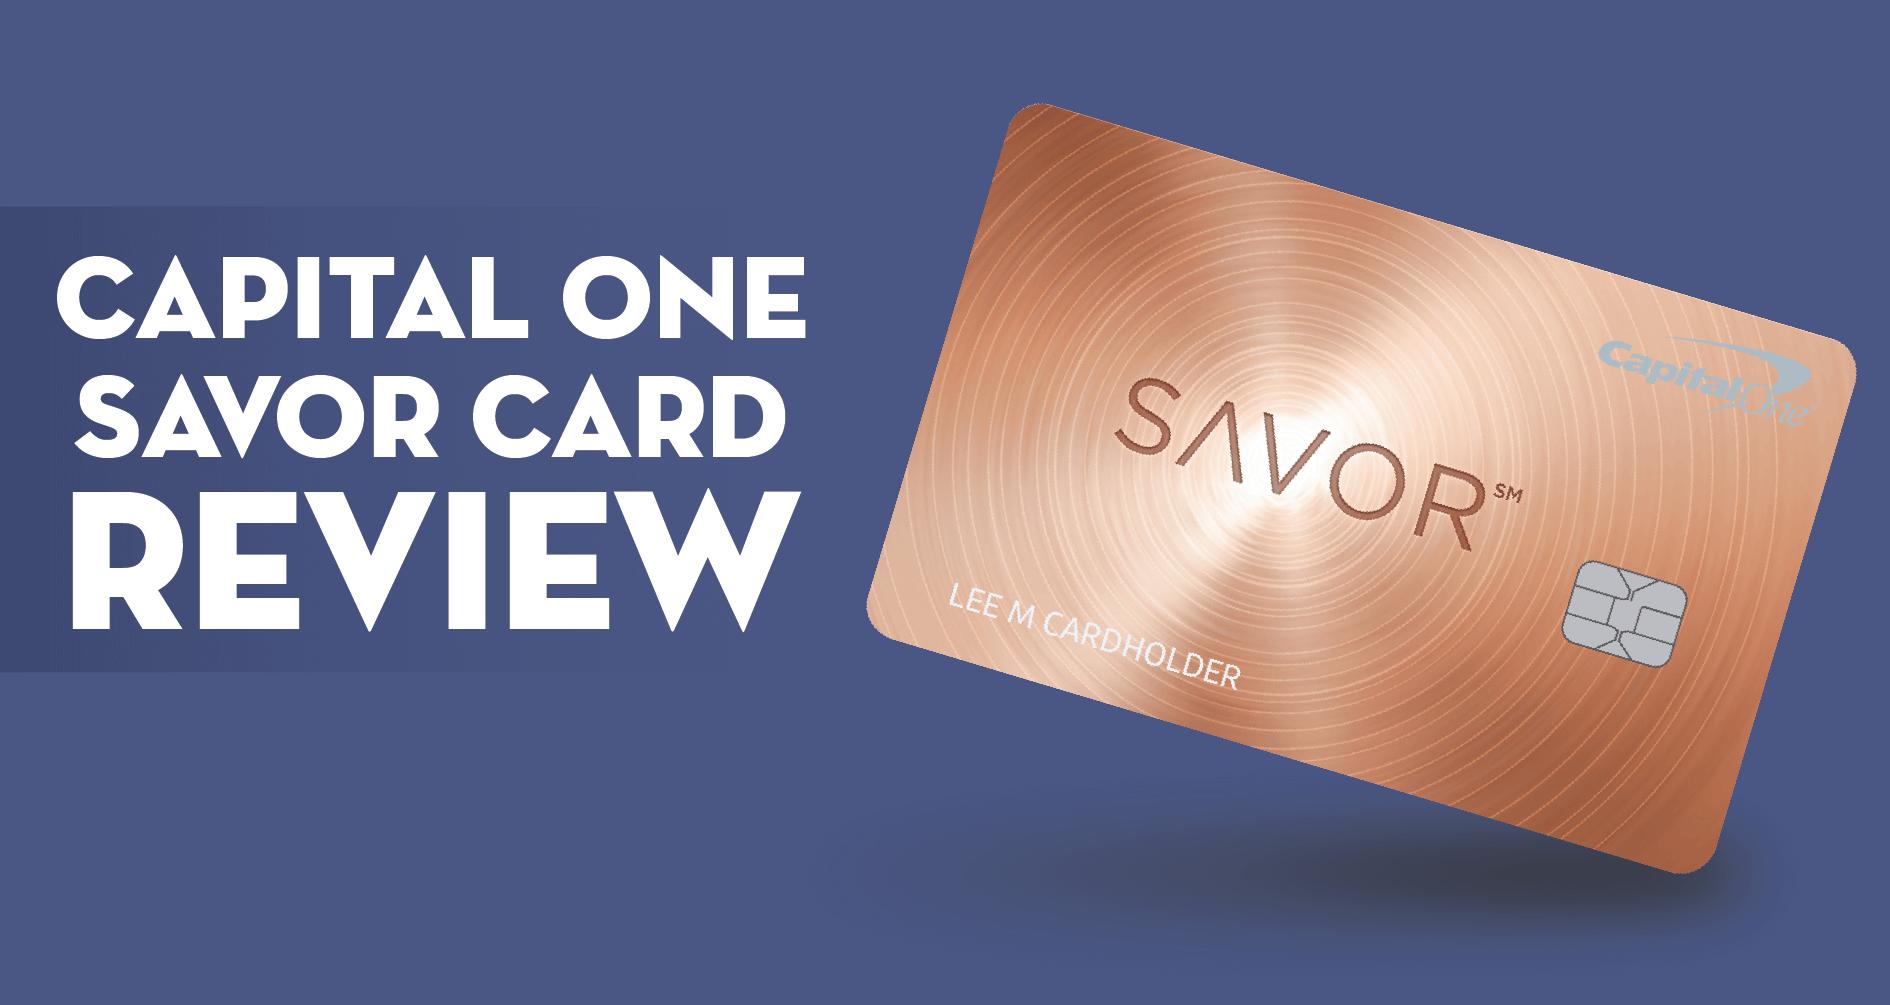 Capital One Savor Card Review - CreditLoan.com®